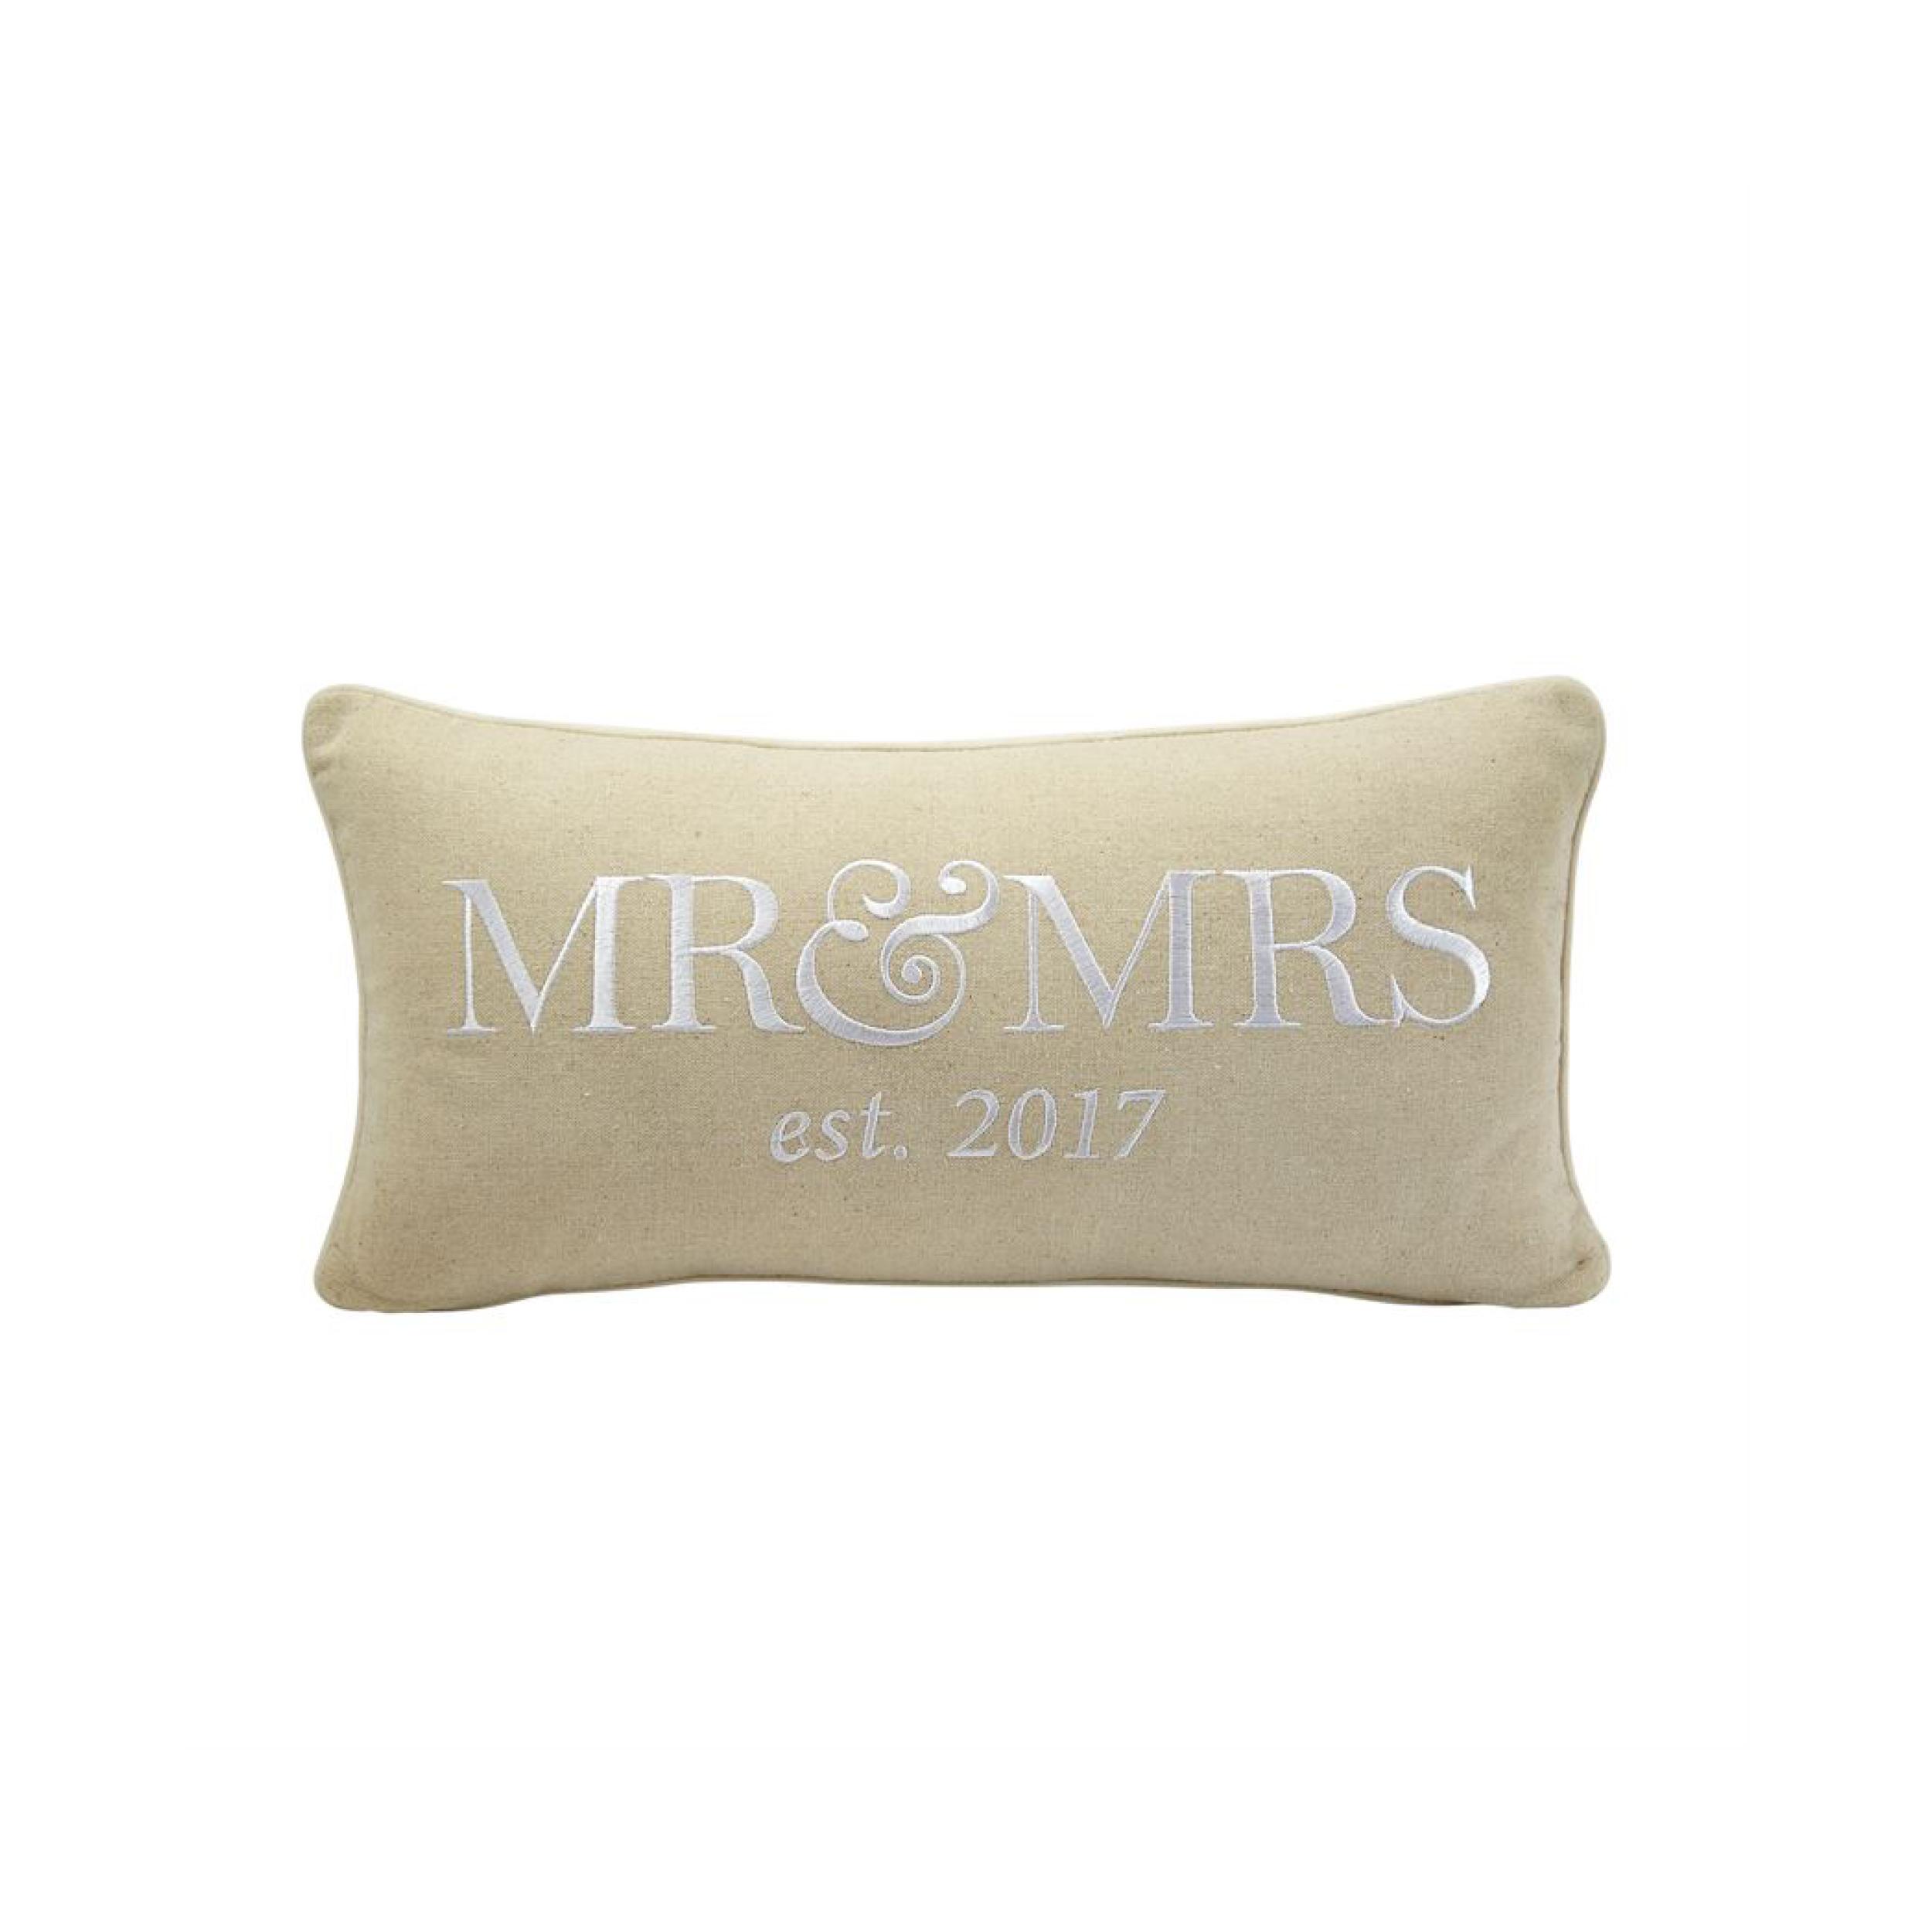 Mr & Mrs 2017 Pillow $25.95   Wants 1 Has 1 Needs 0